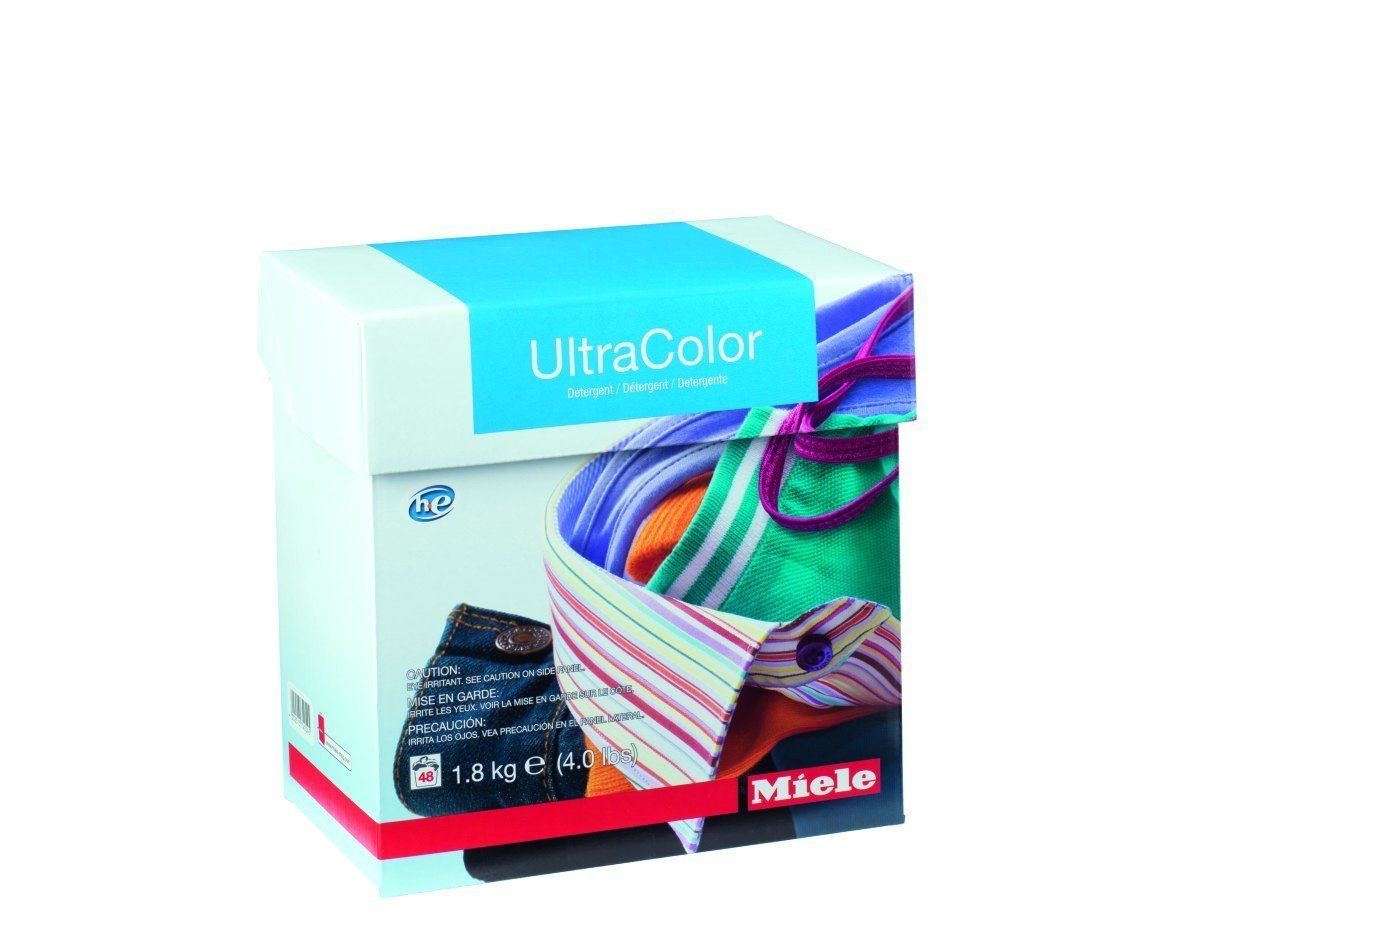 Powder Detergent Ultra Color